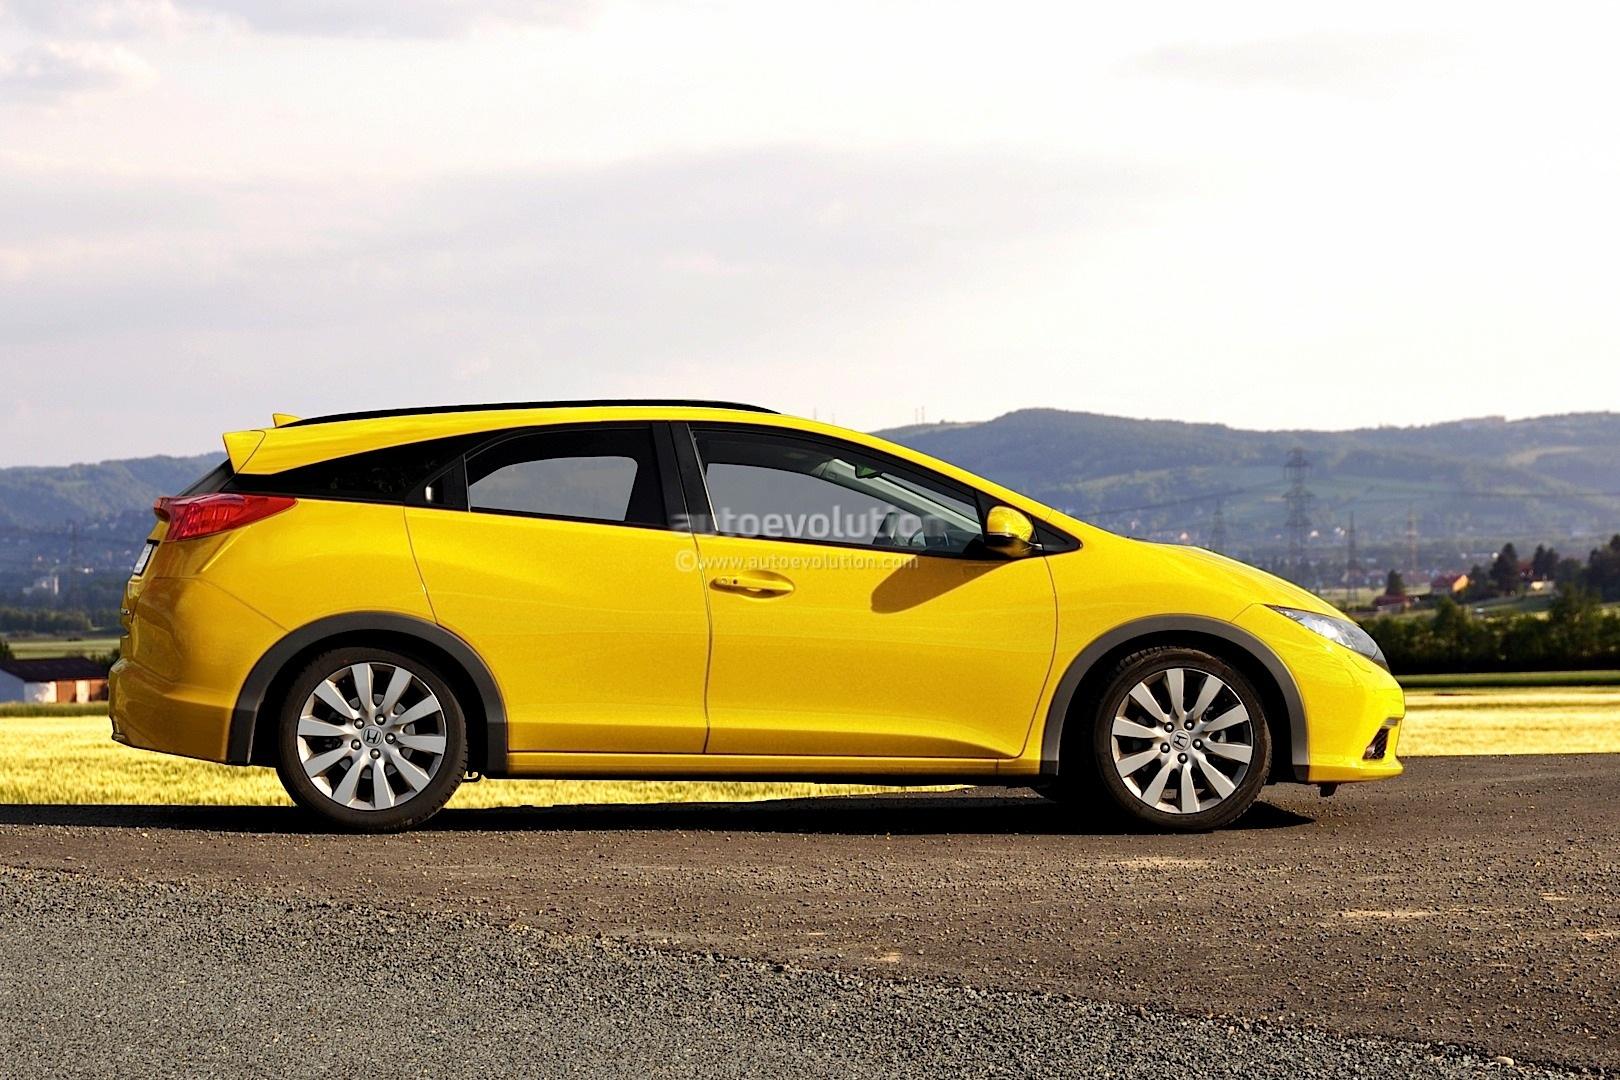 2014 Honda Civic Estate / Wagon Rendering - autoevolution